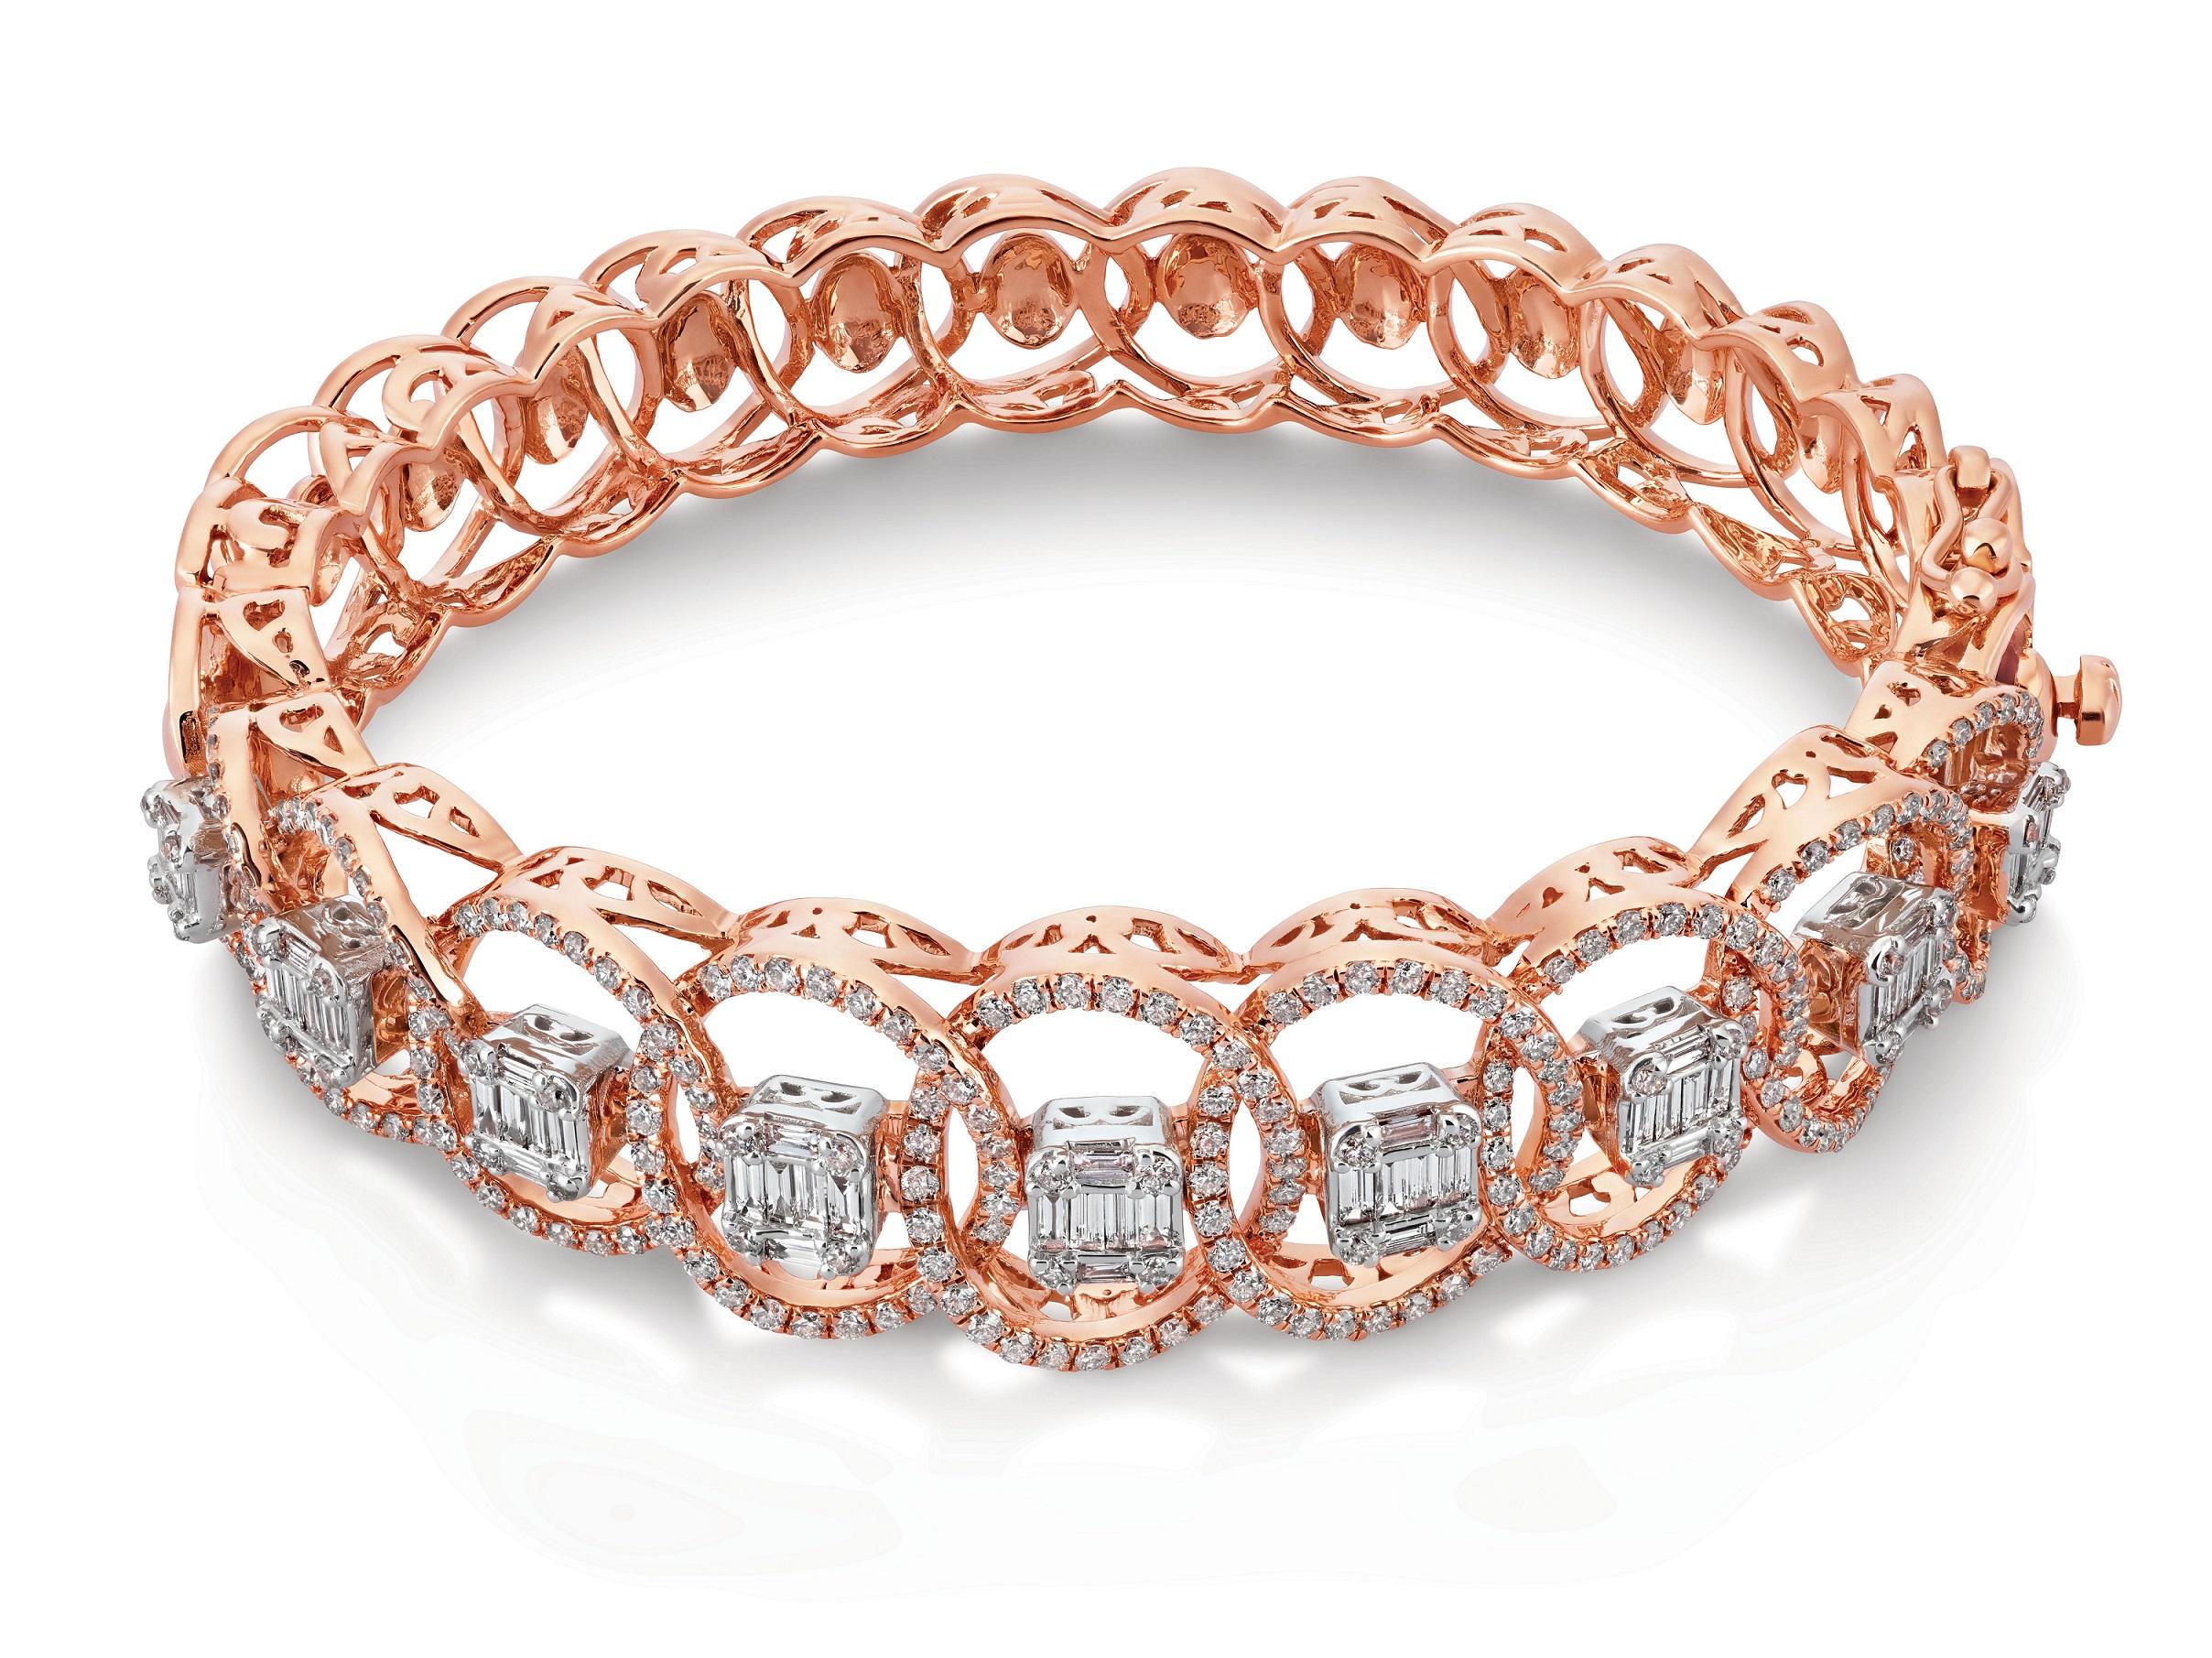 Rose Gold bracelet with diamonds